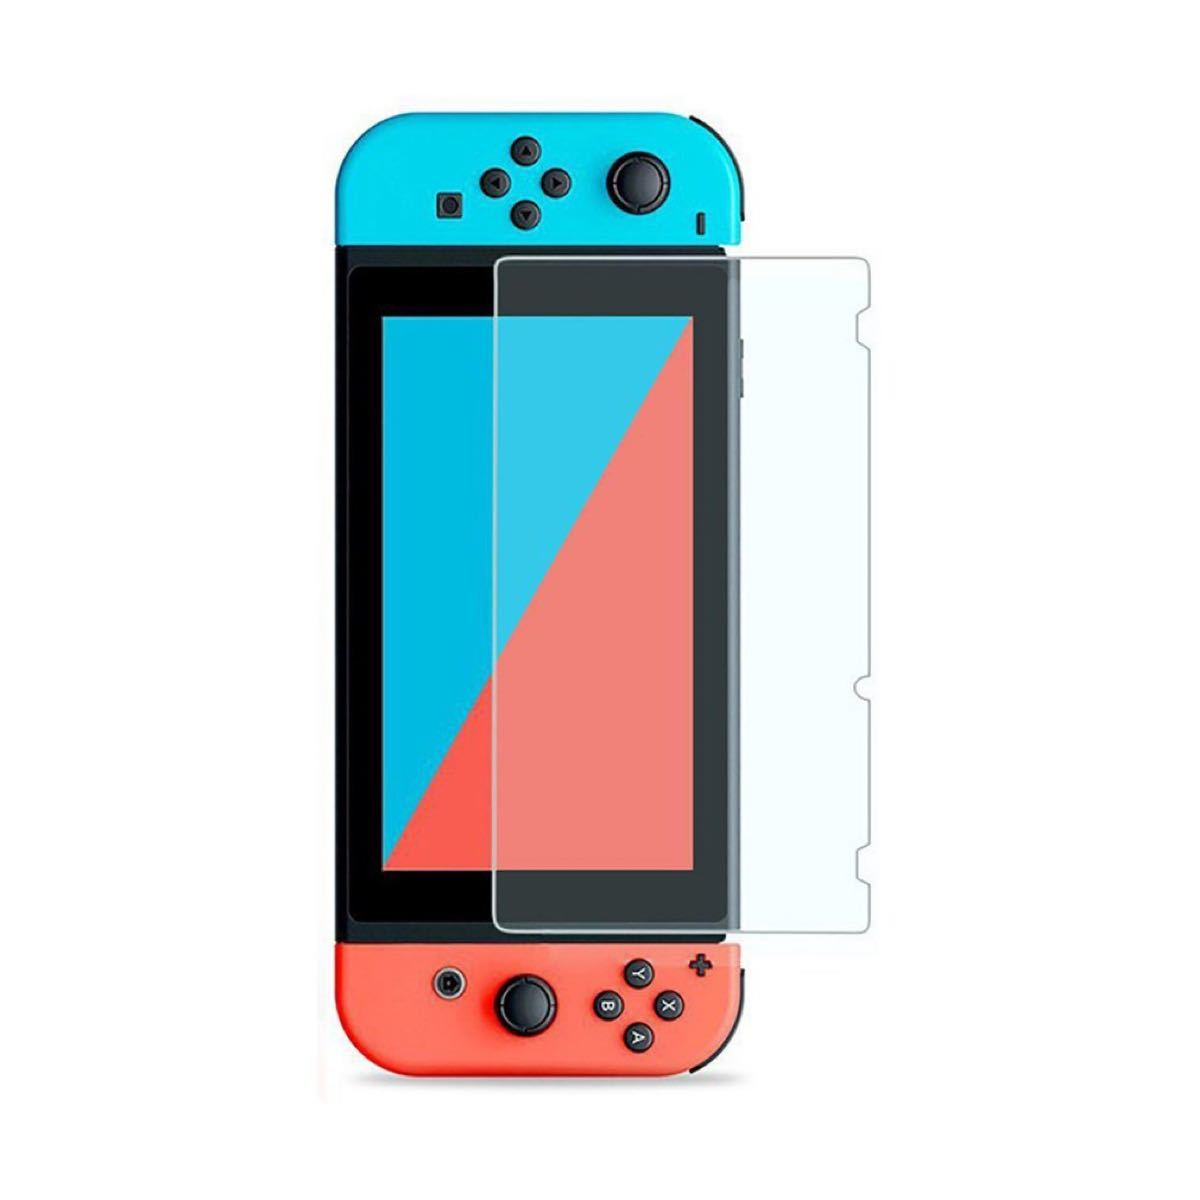 Nintendo Switch 保護フィルム ニンテンドースイッチ 強化ガラス 任天堂 任天堂スイッチ Nintendo